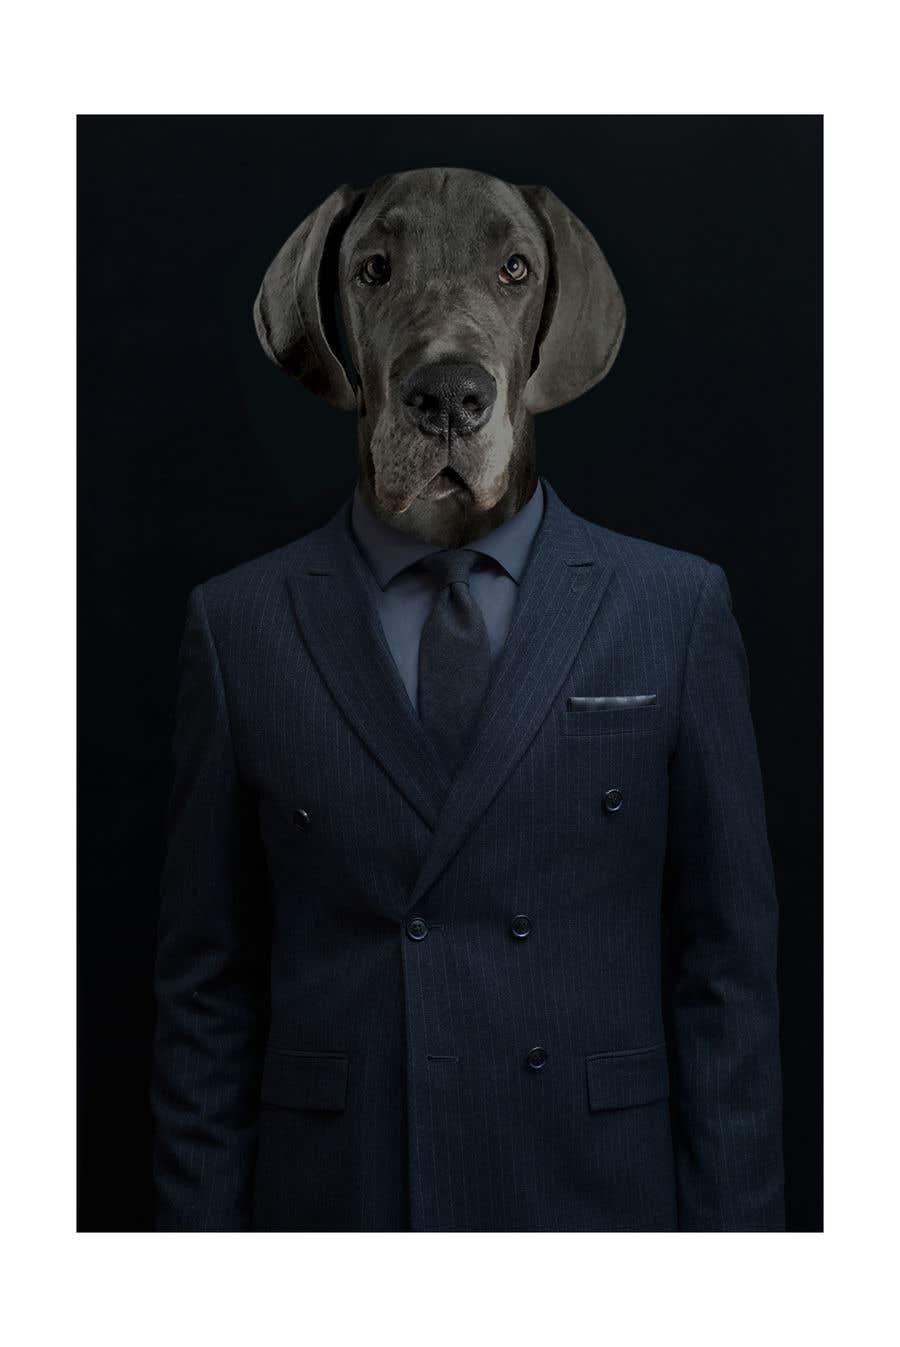 Konkurrenceindlæg #168 for Enhance Dog Photos; Beautifully, Creatively!